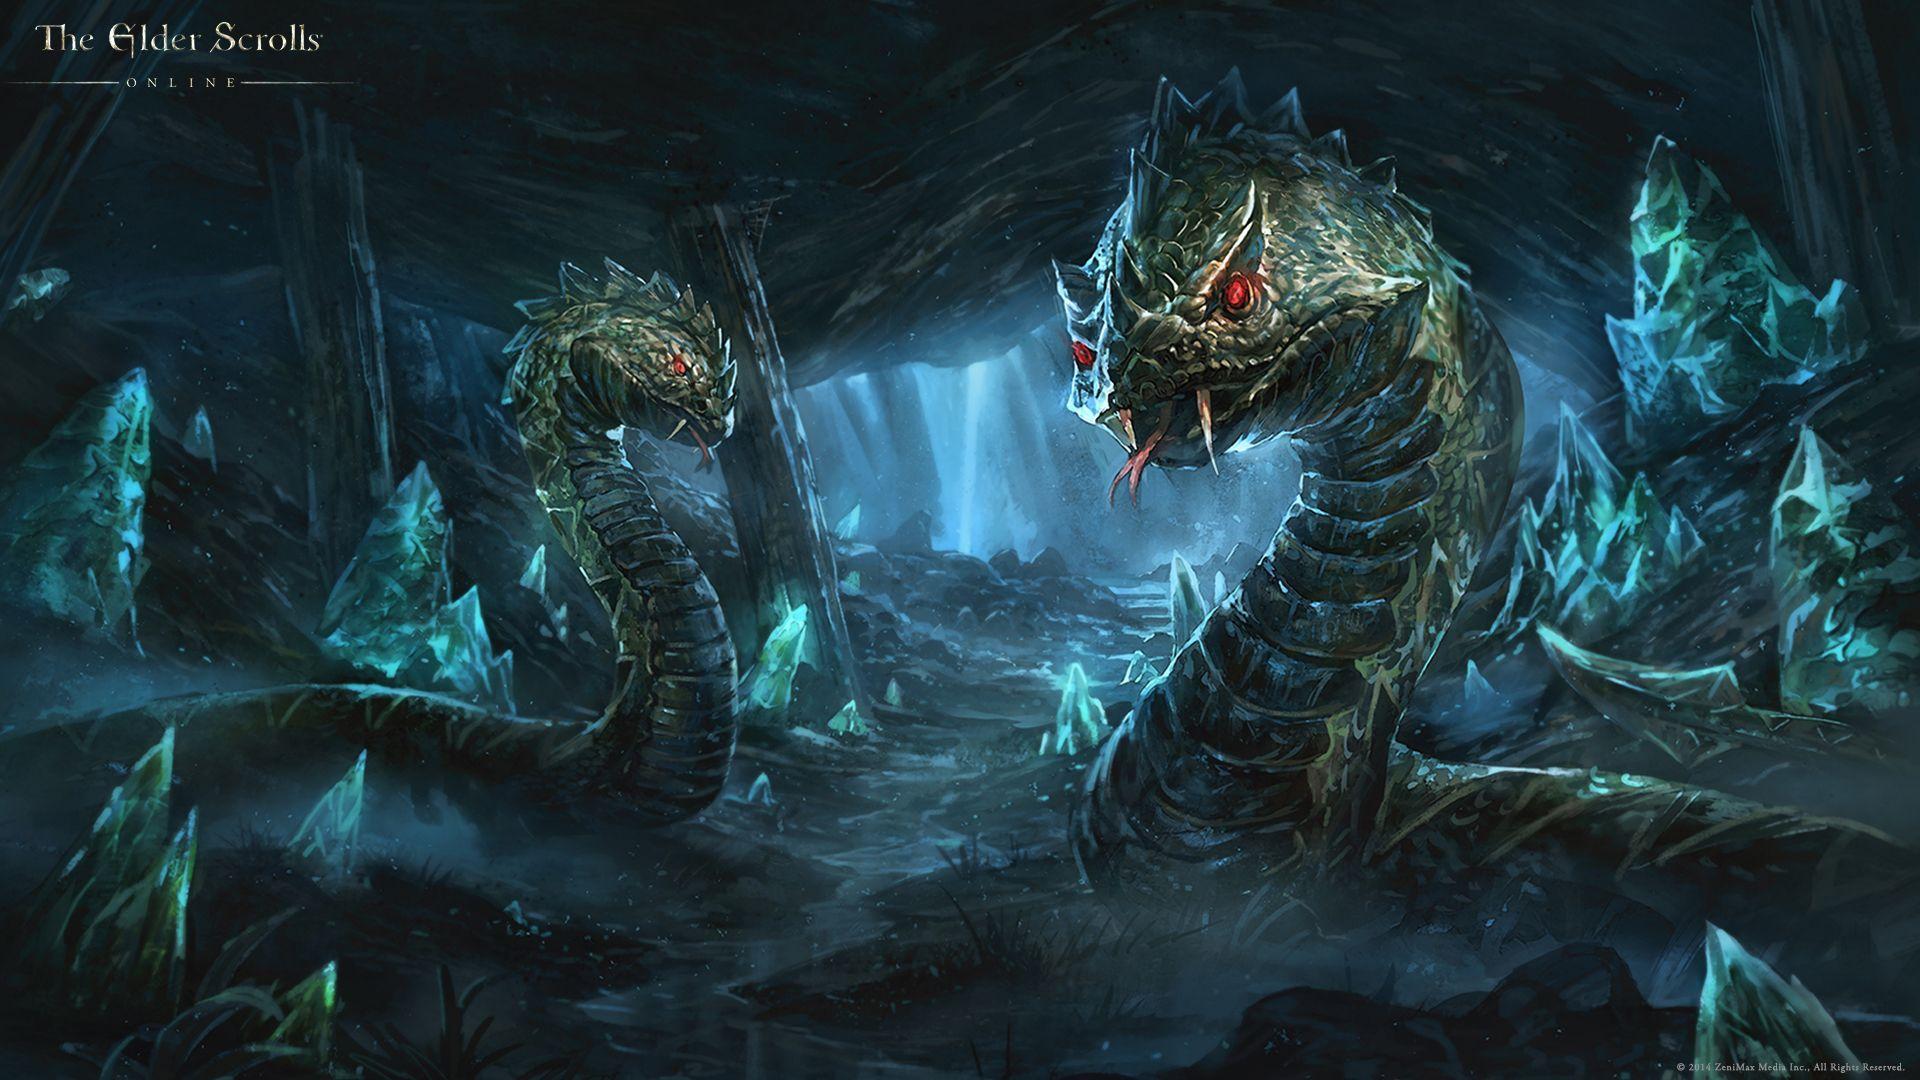 Elder Scrolls Wallpapers Top Free Elder Scrolls